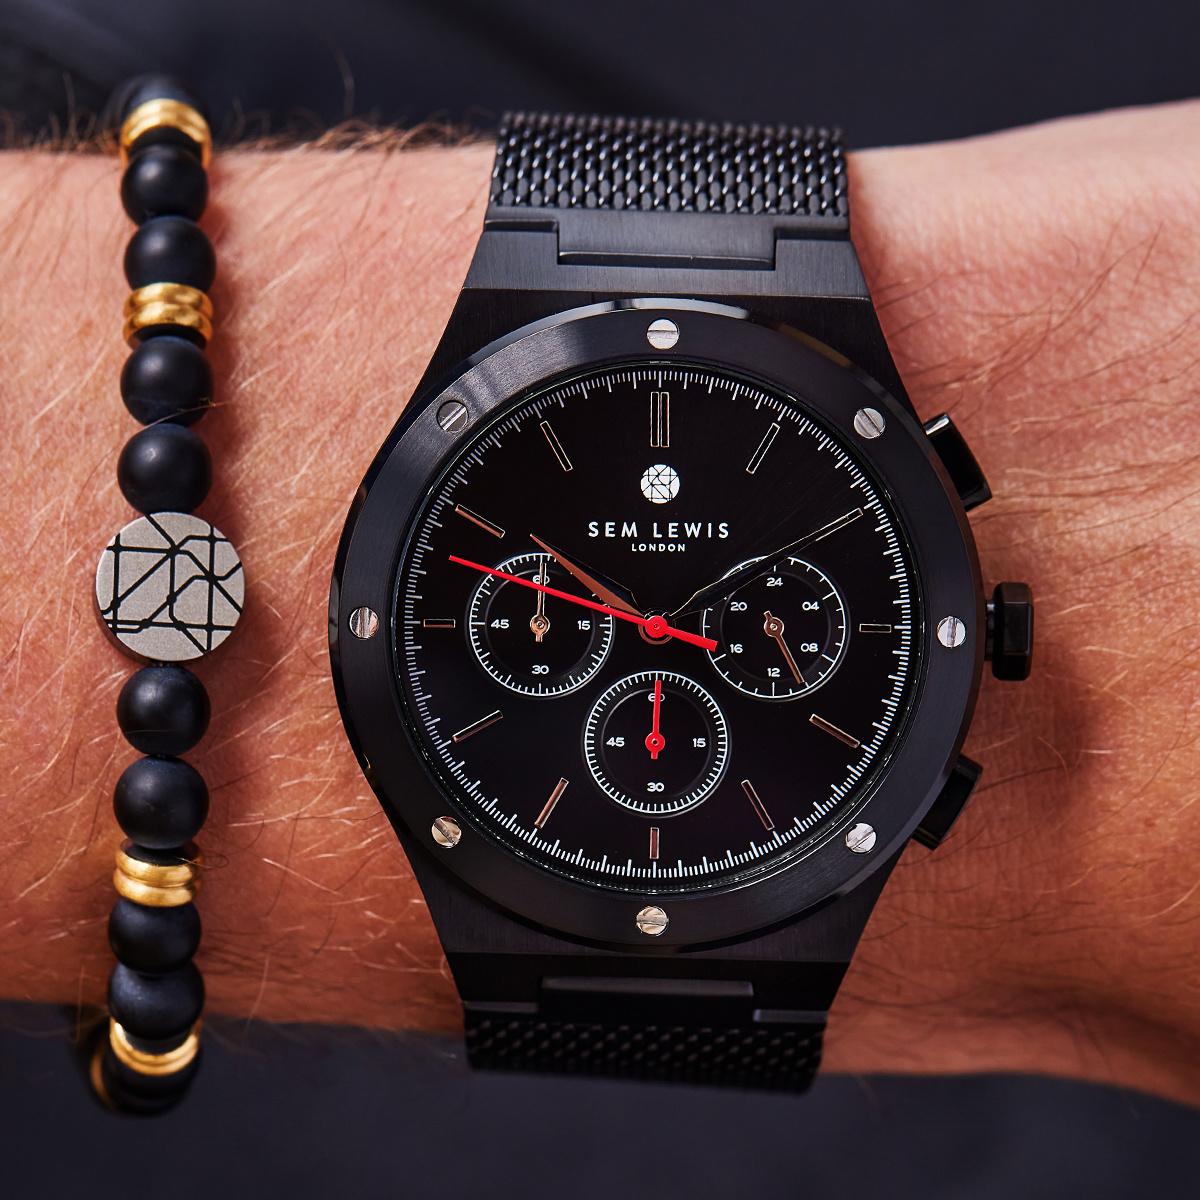 Sem Lewis Moorgate chronograph watch black